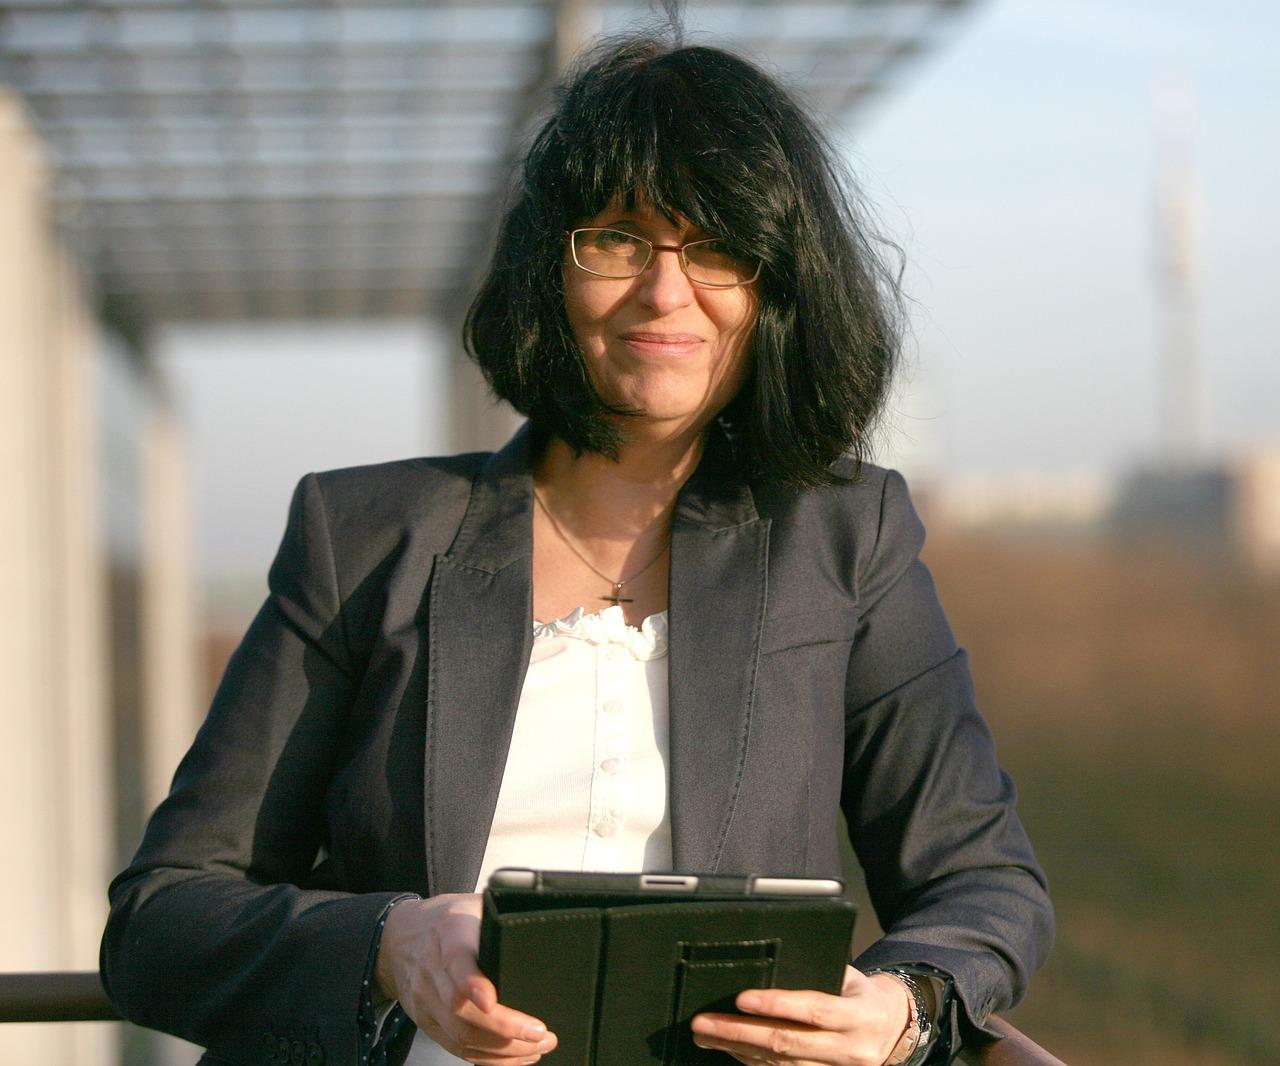 business-woman-746766_1280.jpg